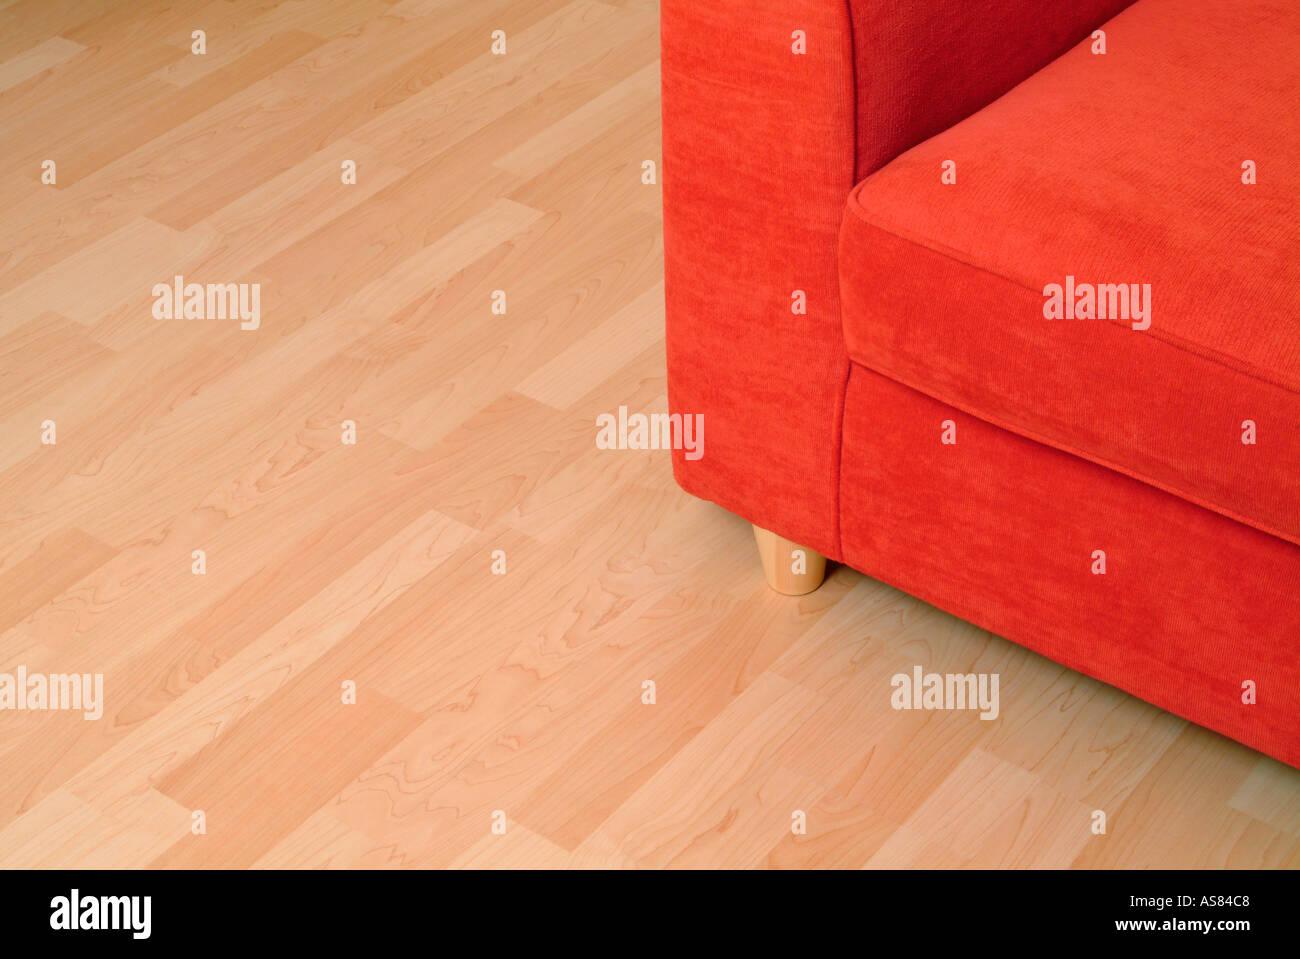 Holzfußboden ~ Rotes sofa auf einem holzfußboden stockfoto bild alamy